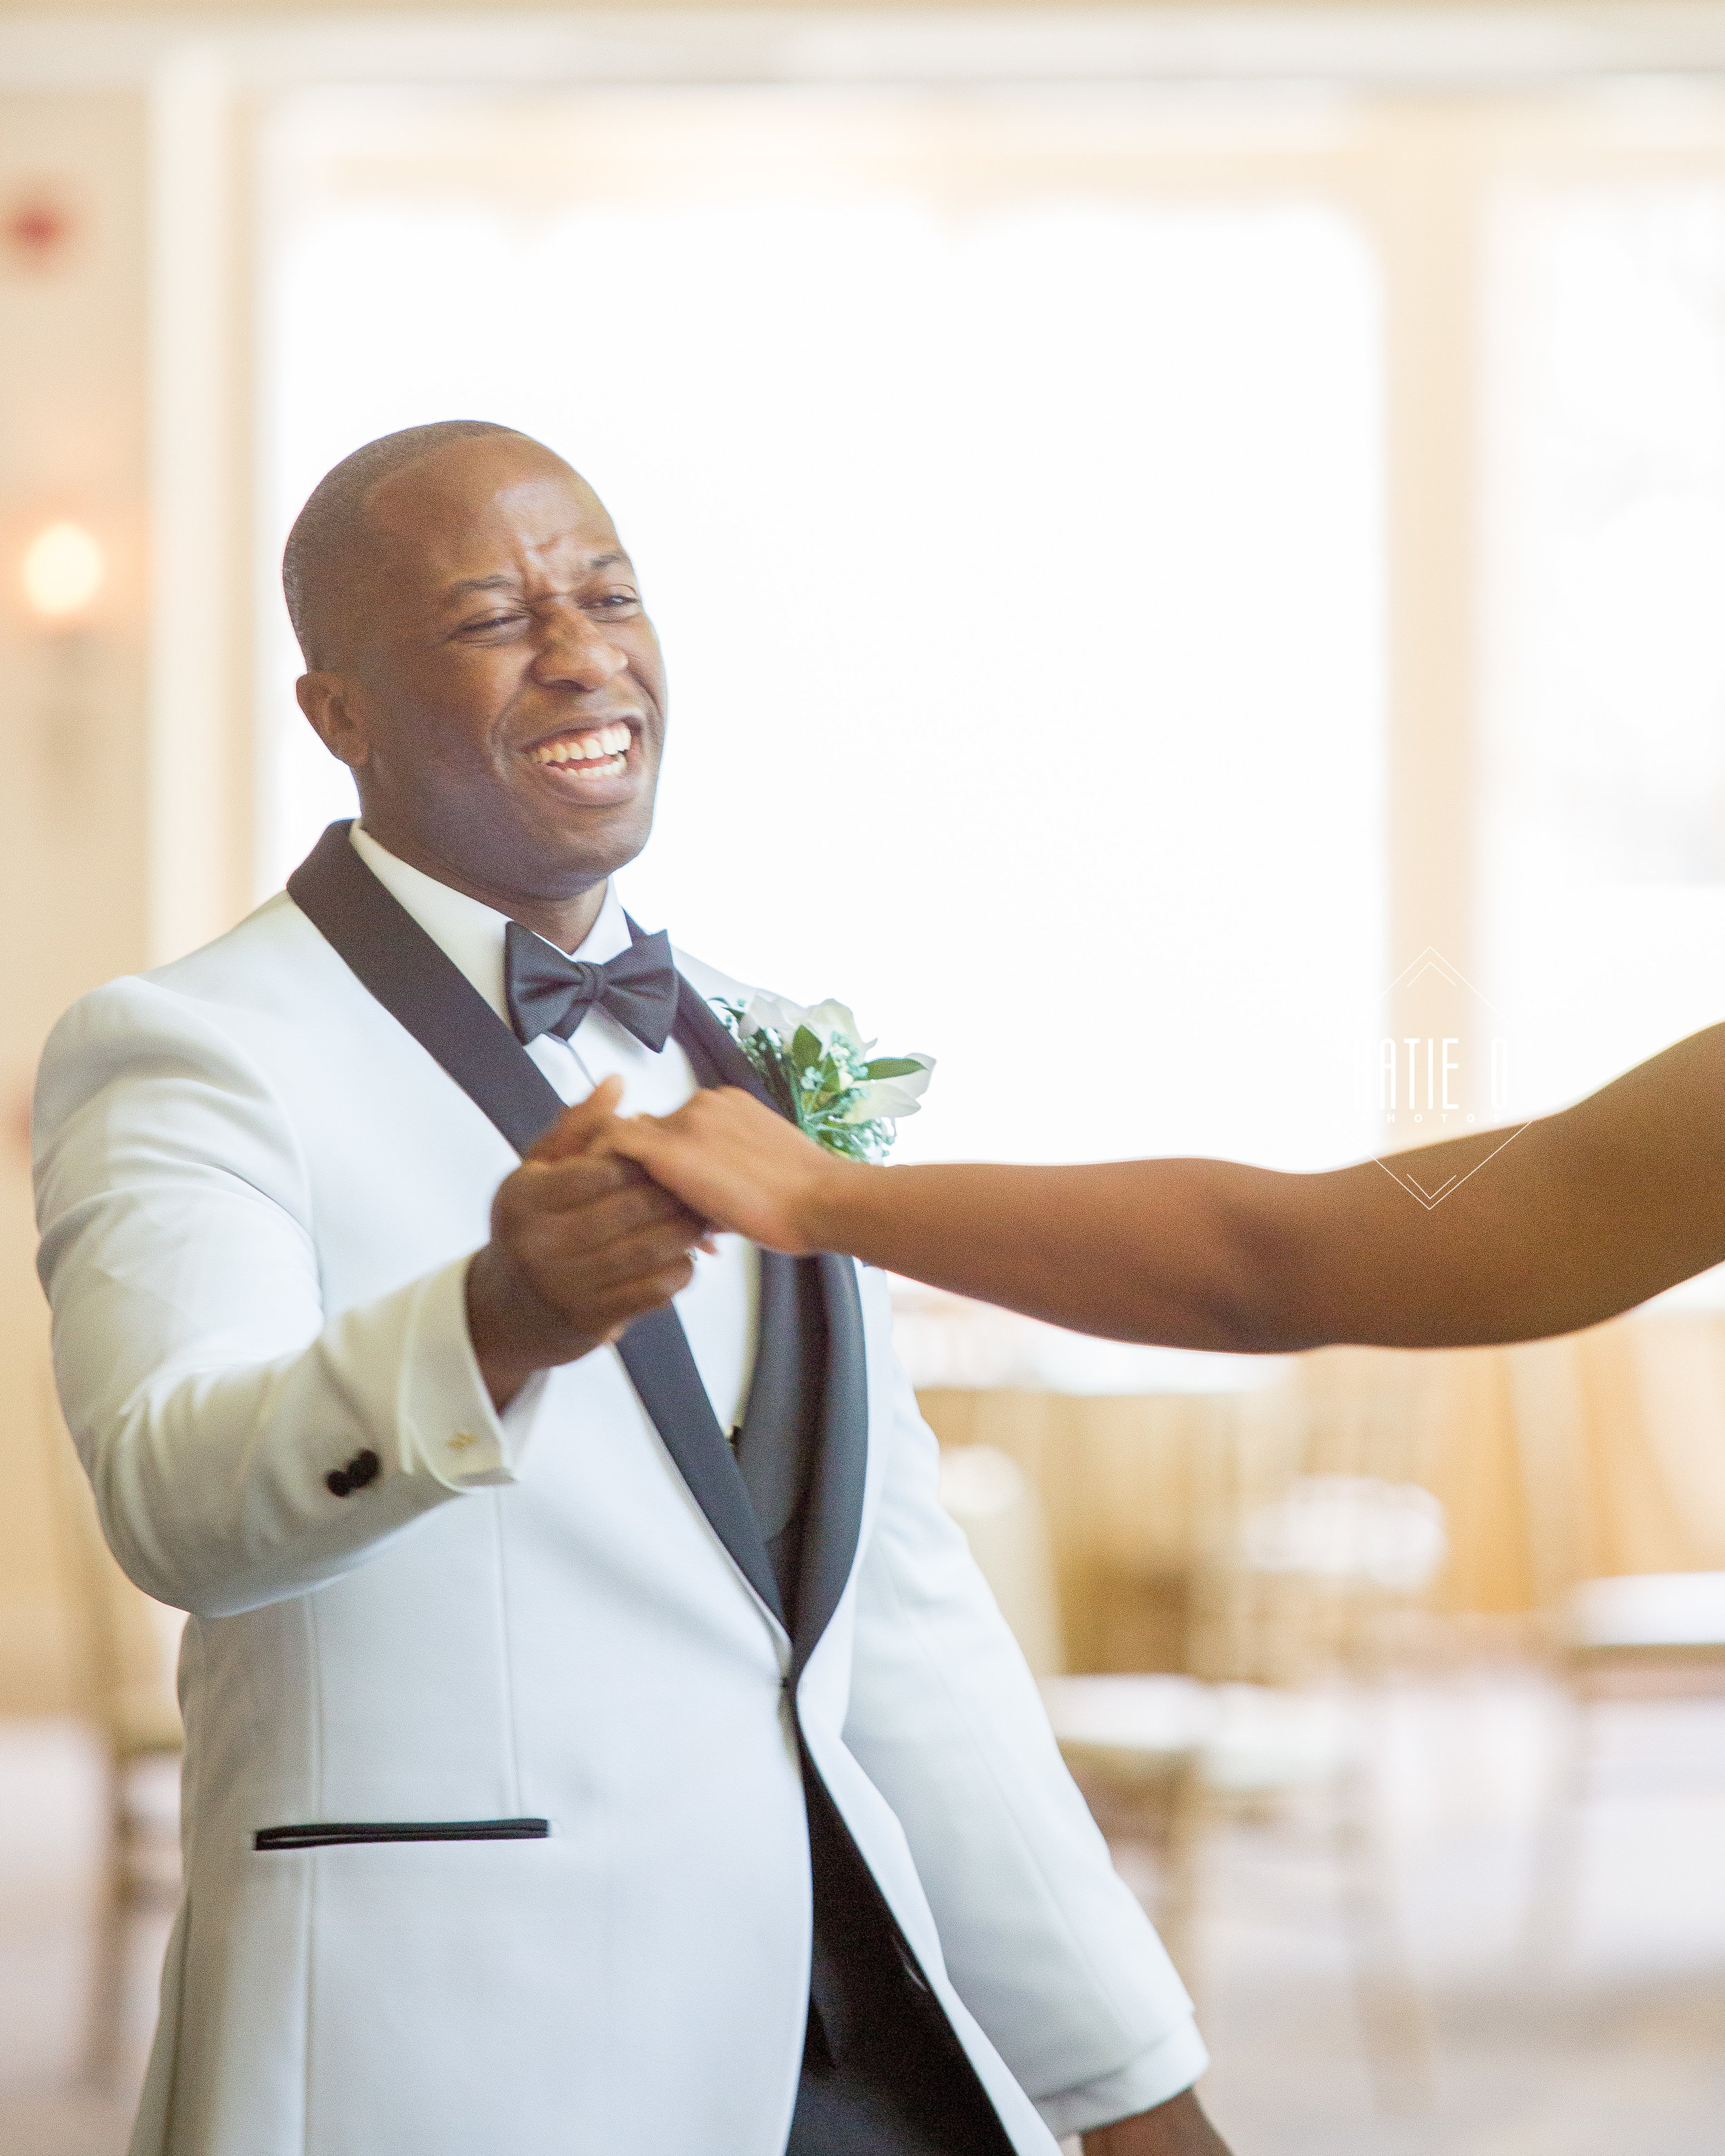 CT-WEDDING-PHOTOGRAPHER-BLOG-35.jpg